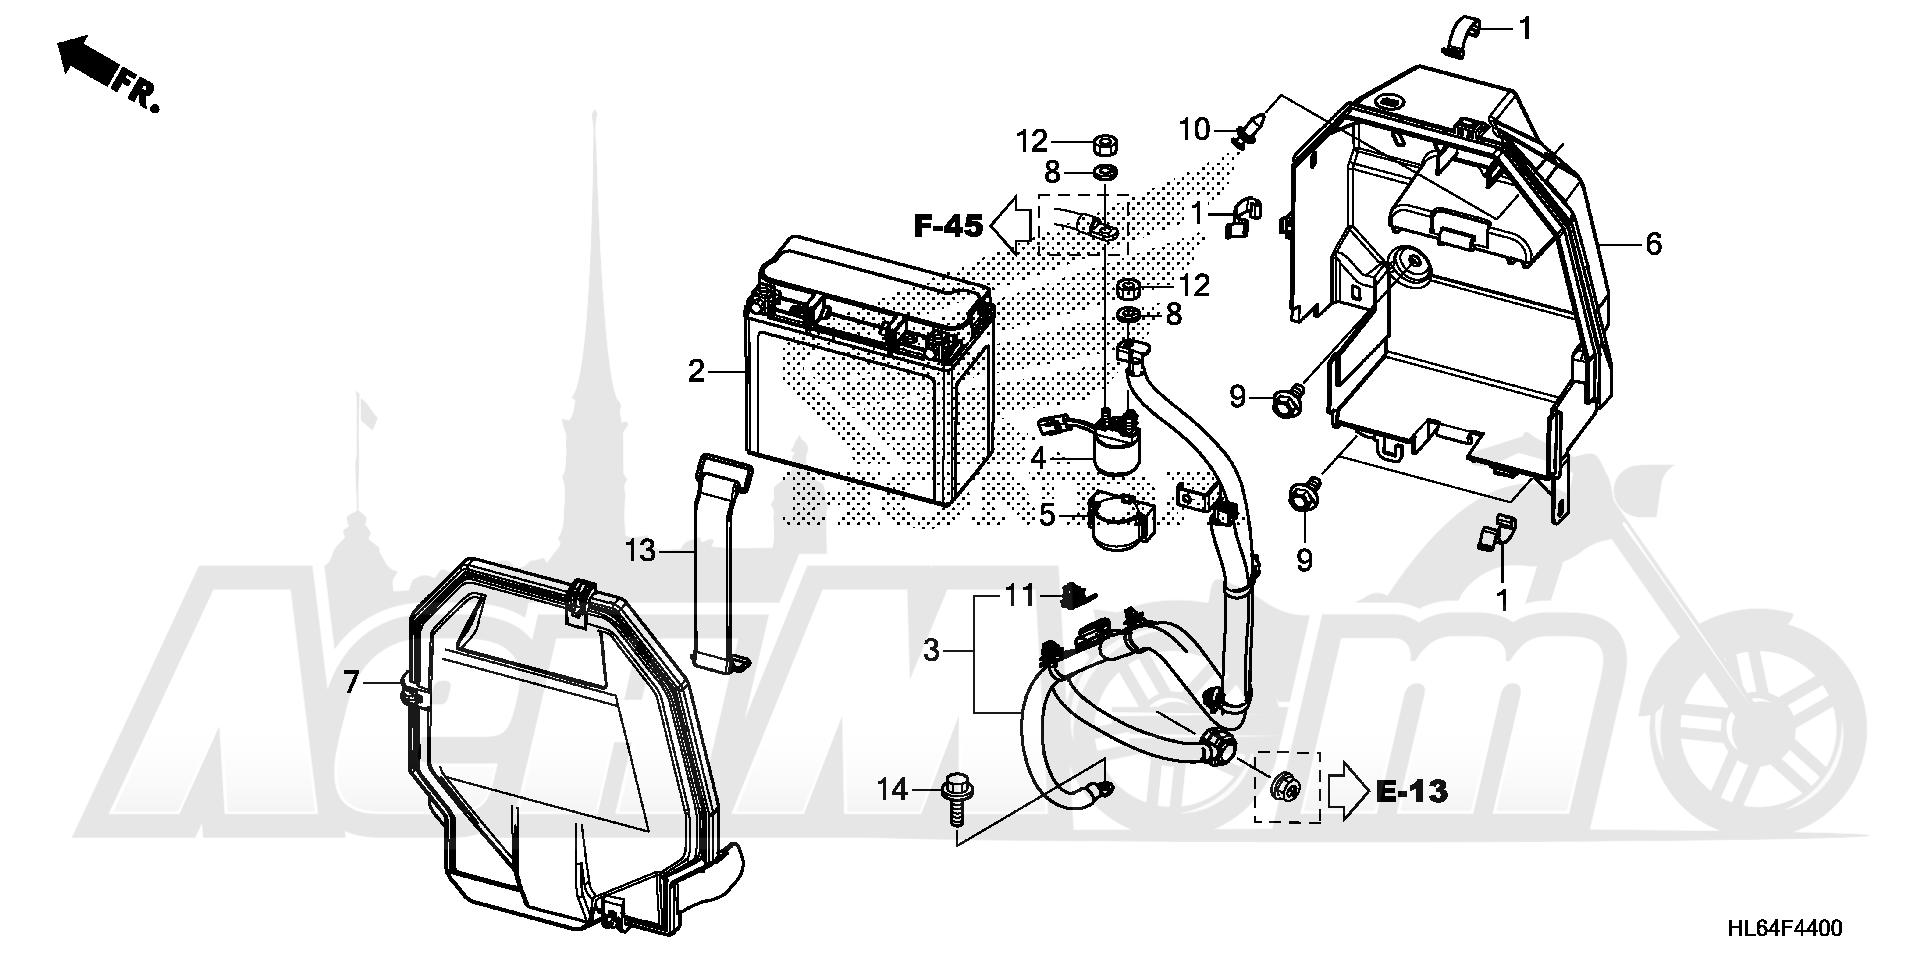 Запчасти для Квадроцикла Honda 2019 SXS1000S2X Раздел: BATTERY | аккумулятор